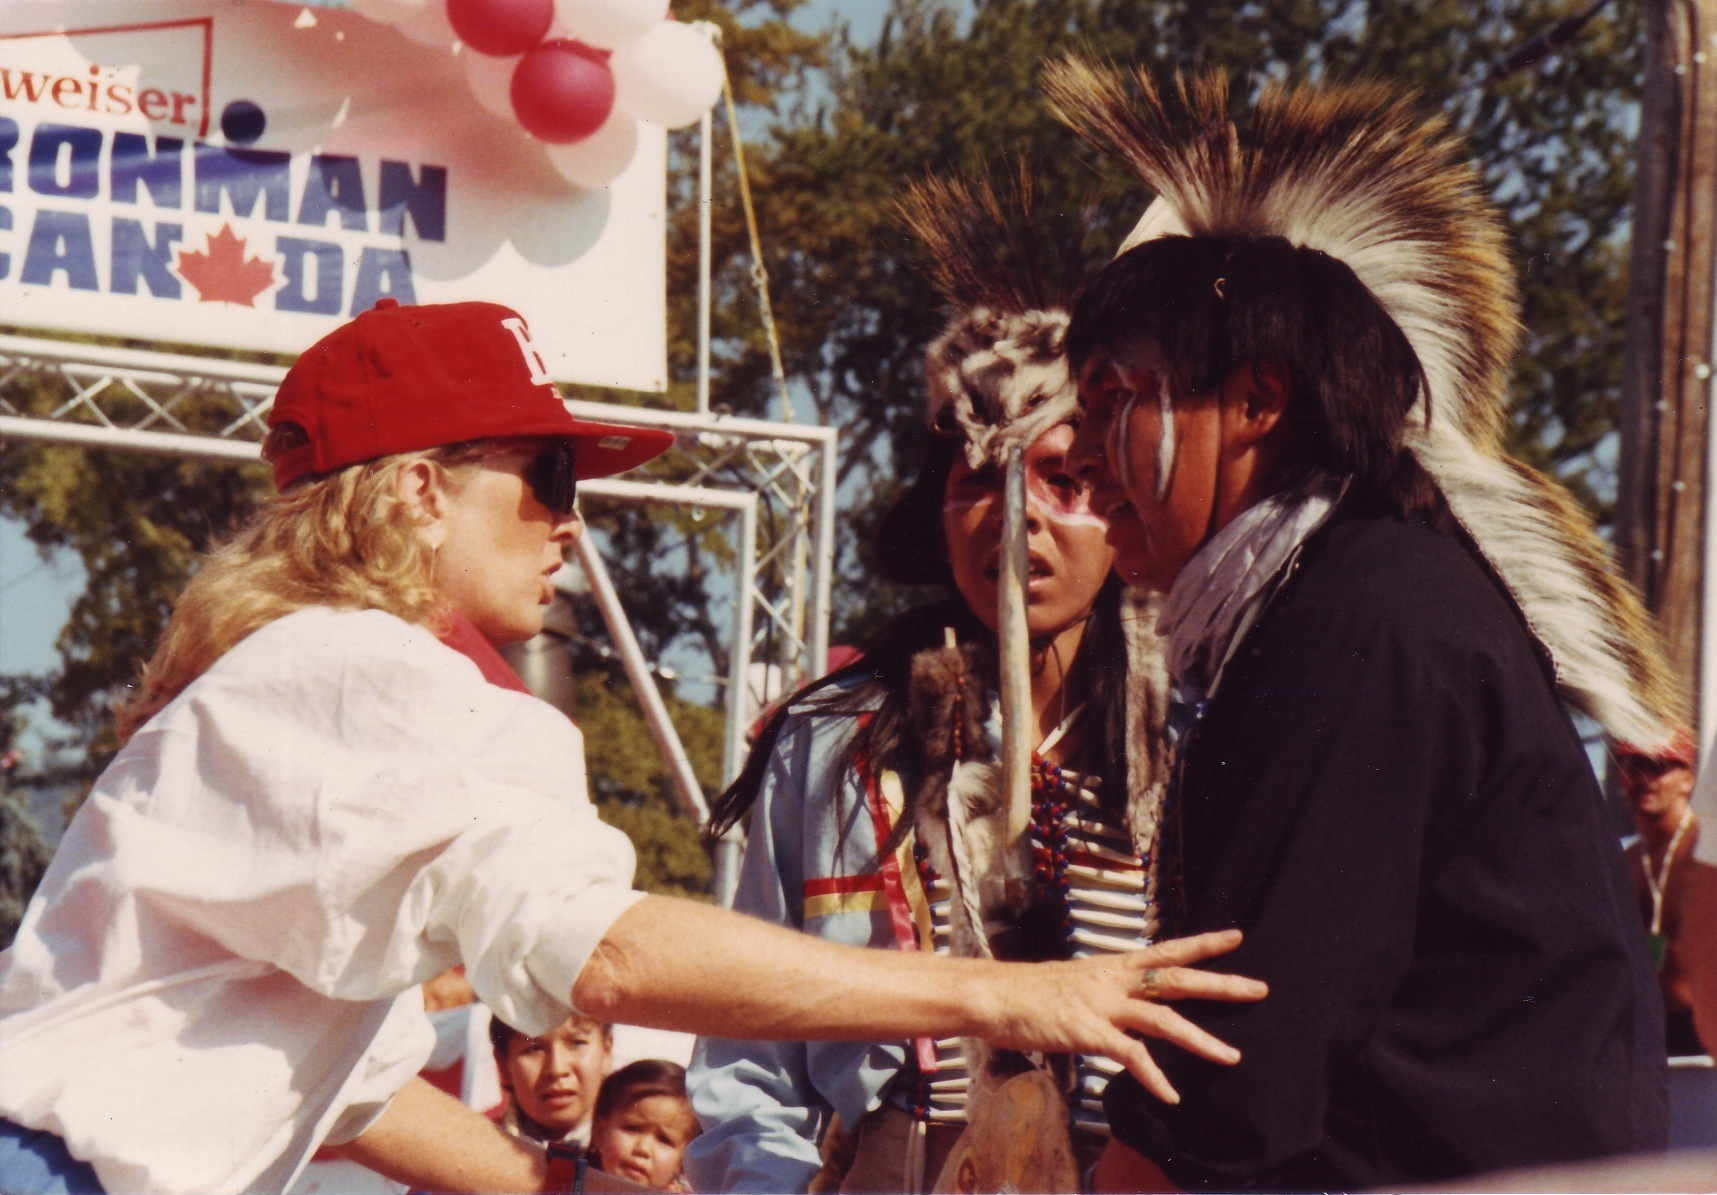 Lynn Van Dove directs aboriginal dancers at Ironman Canada